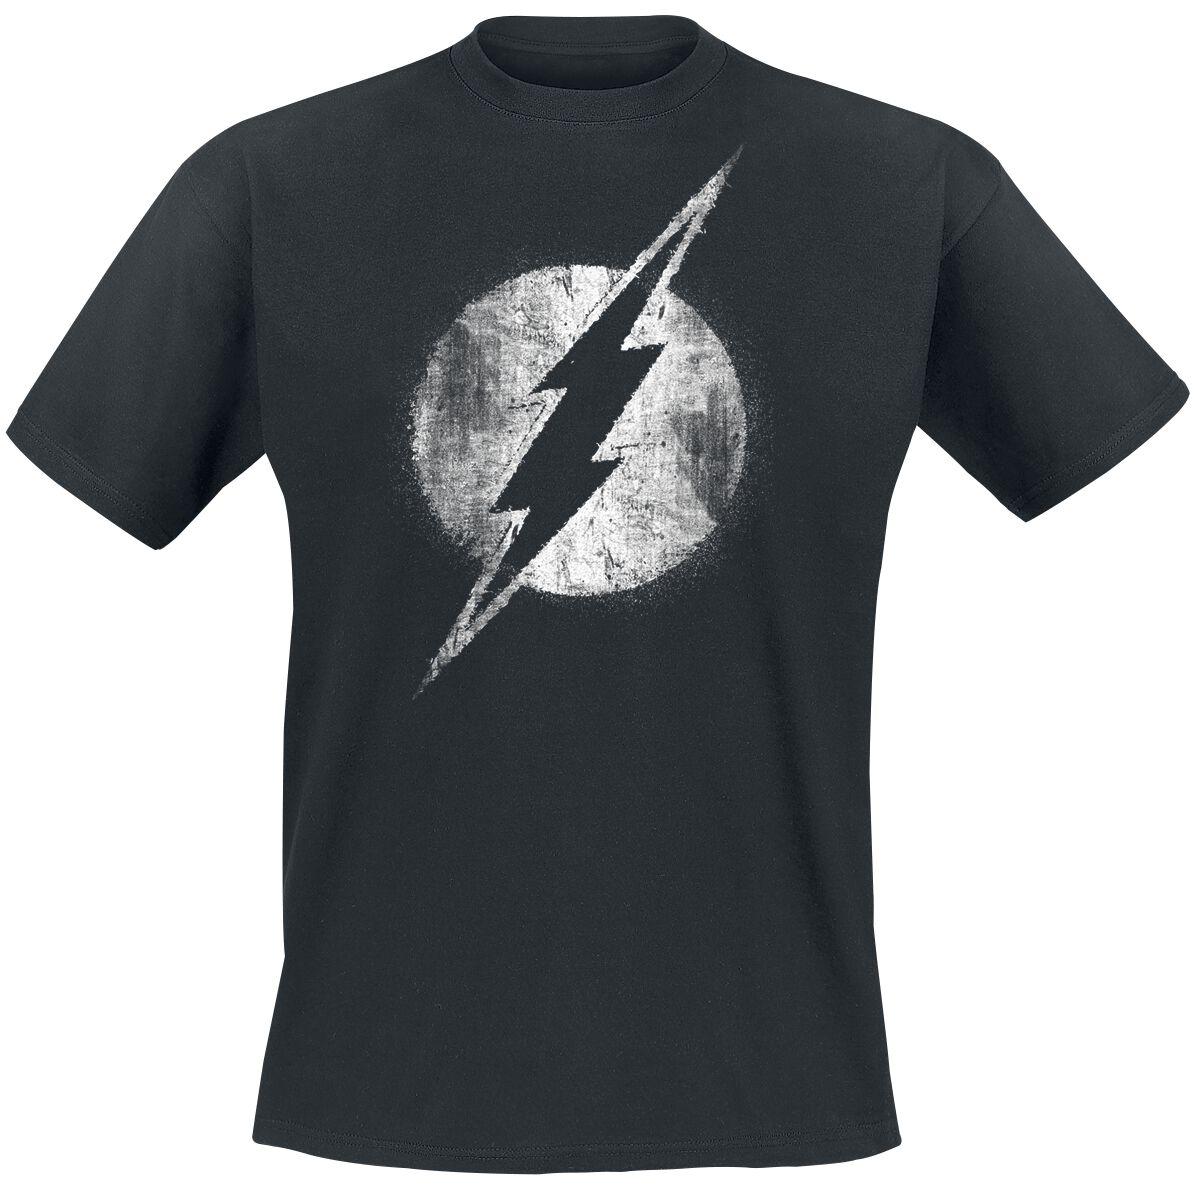 Merch dla Fanów - Koszulki - T-Shirt The Flash Logo Mono Distressed T-Shirt czarny - 334768